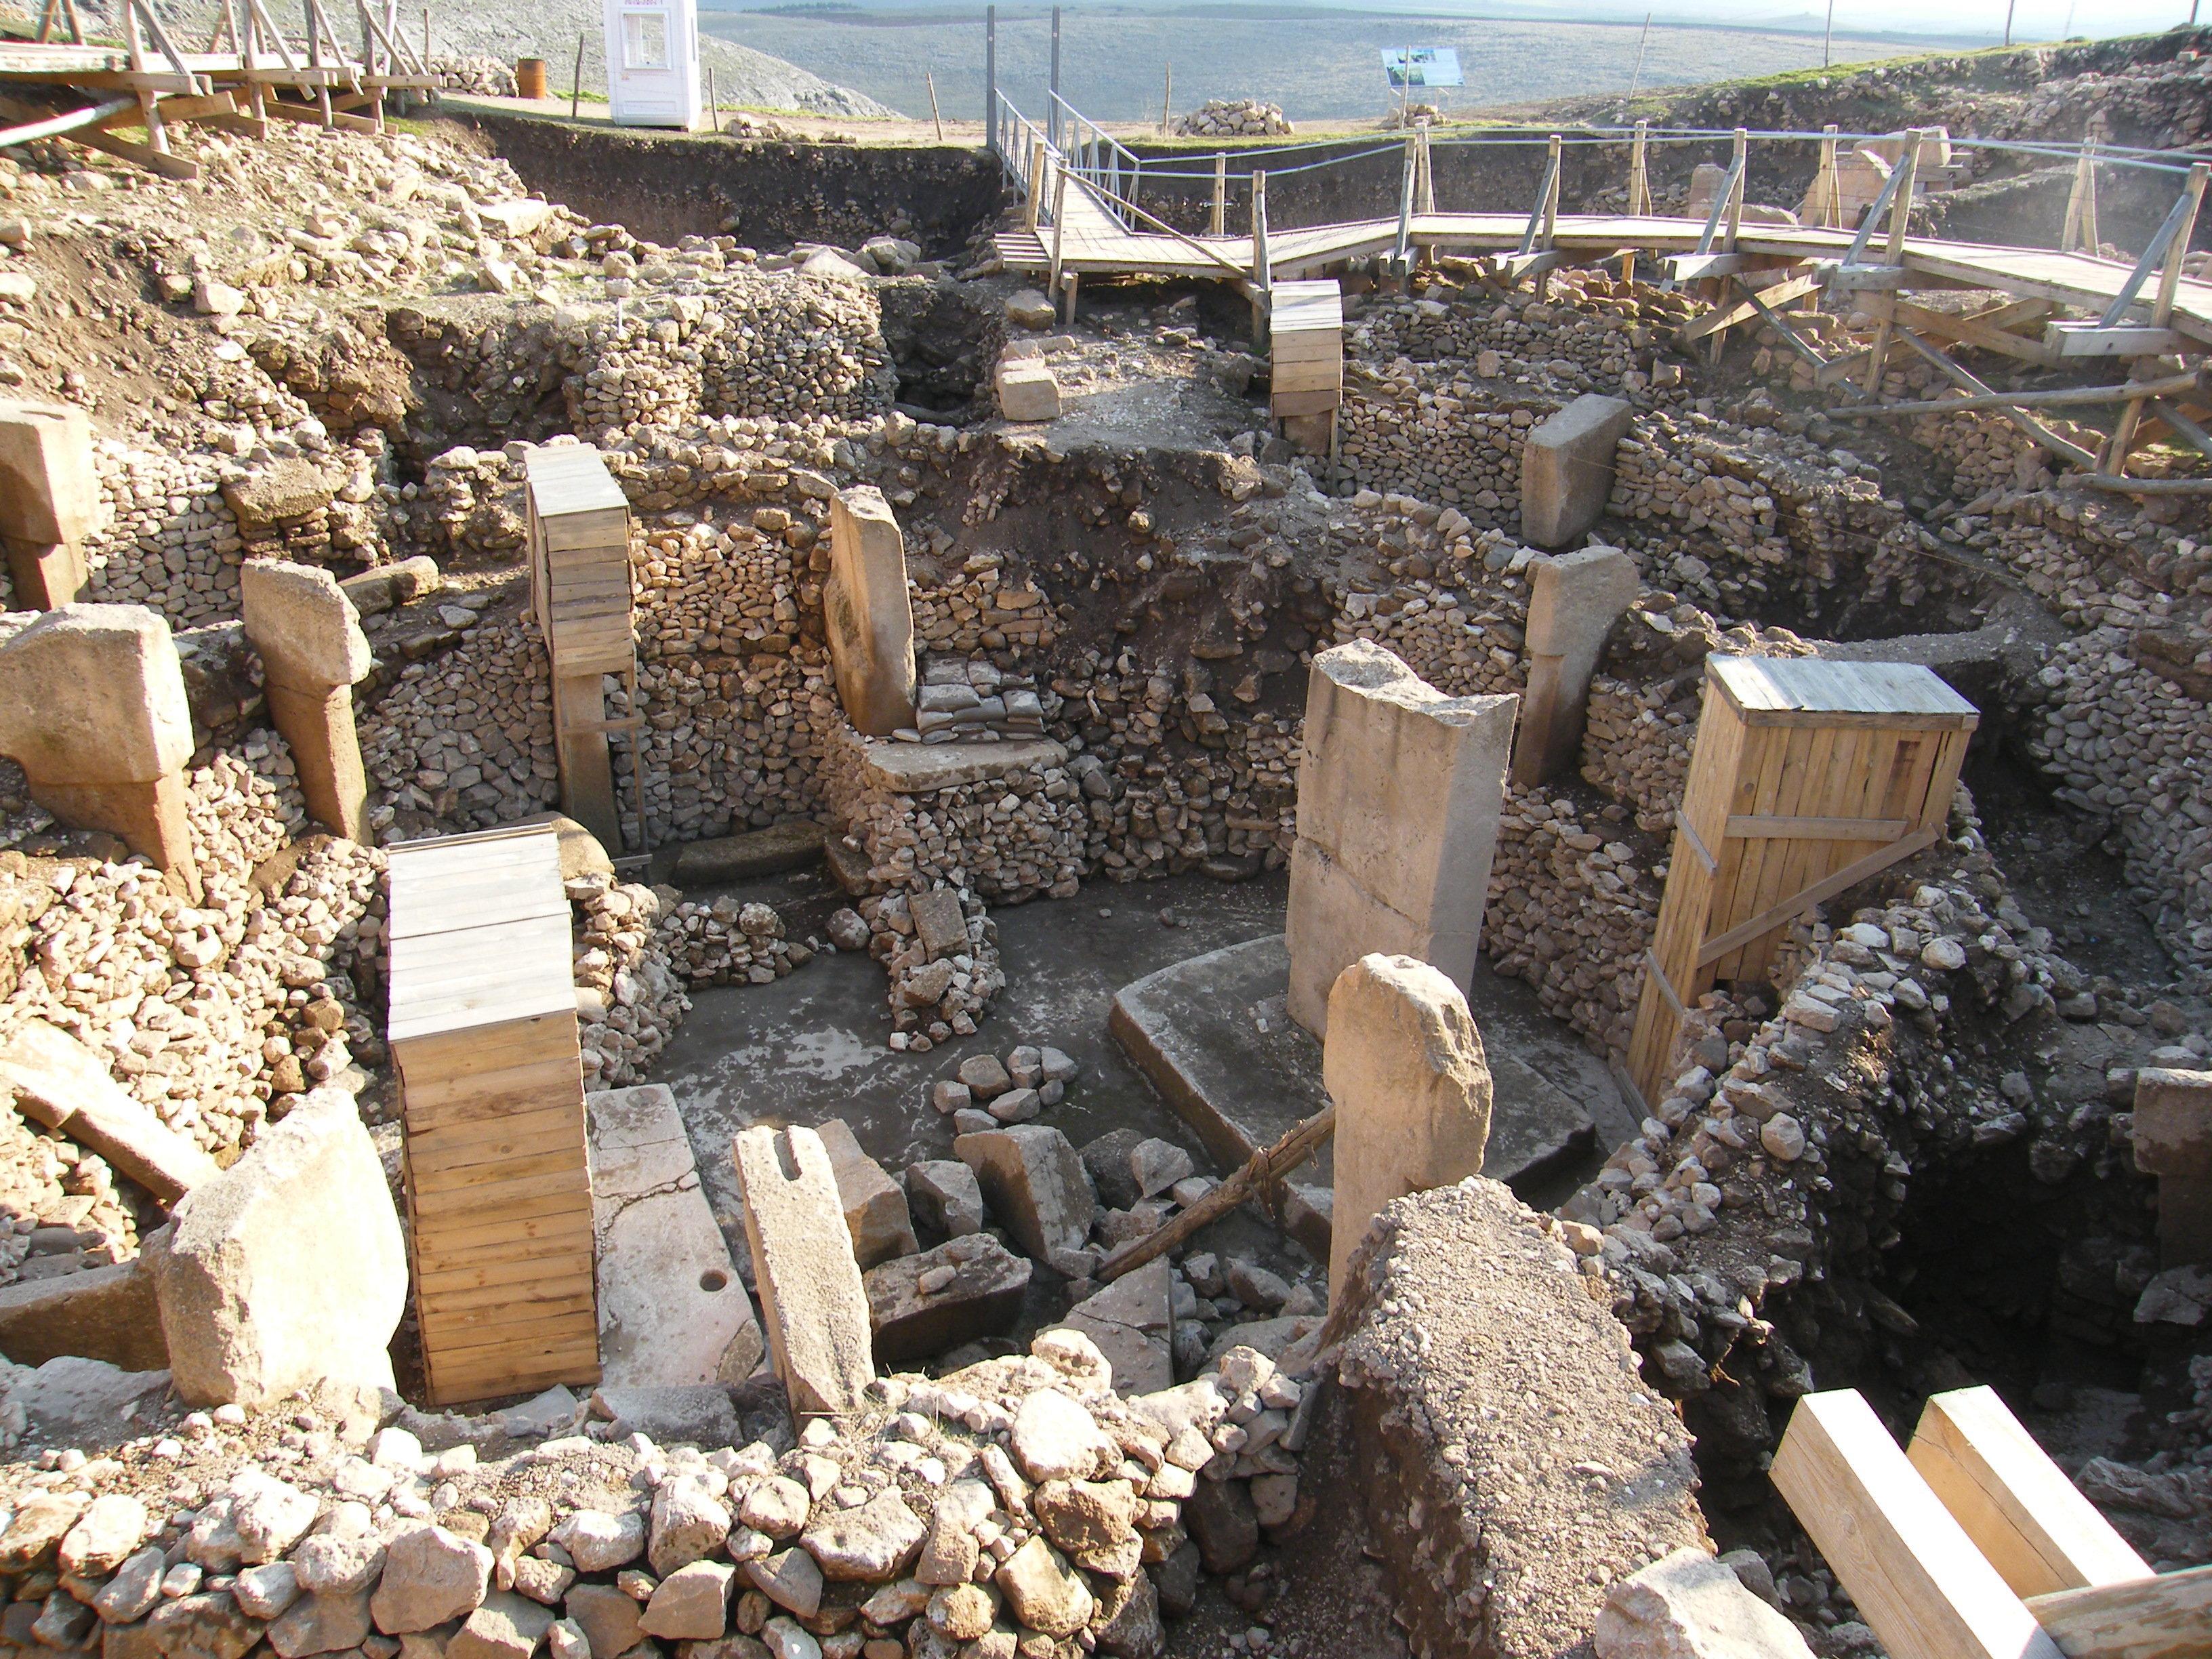 Göbekli Tepe site